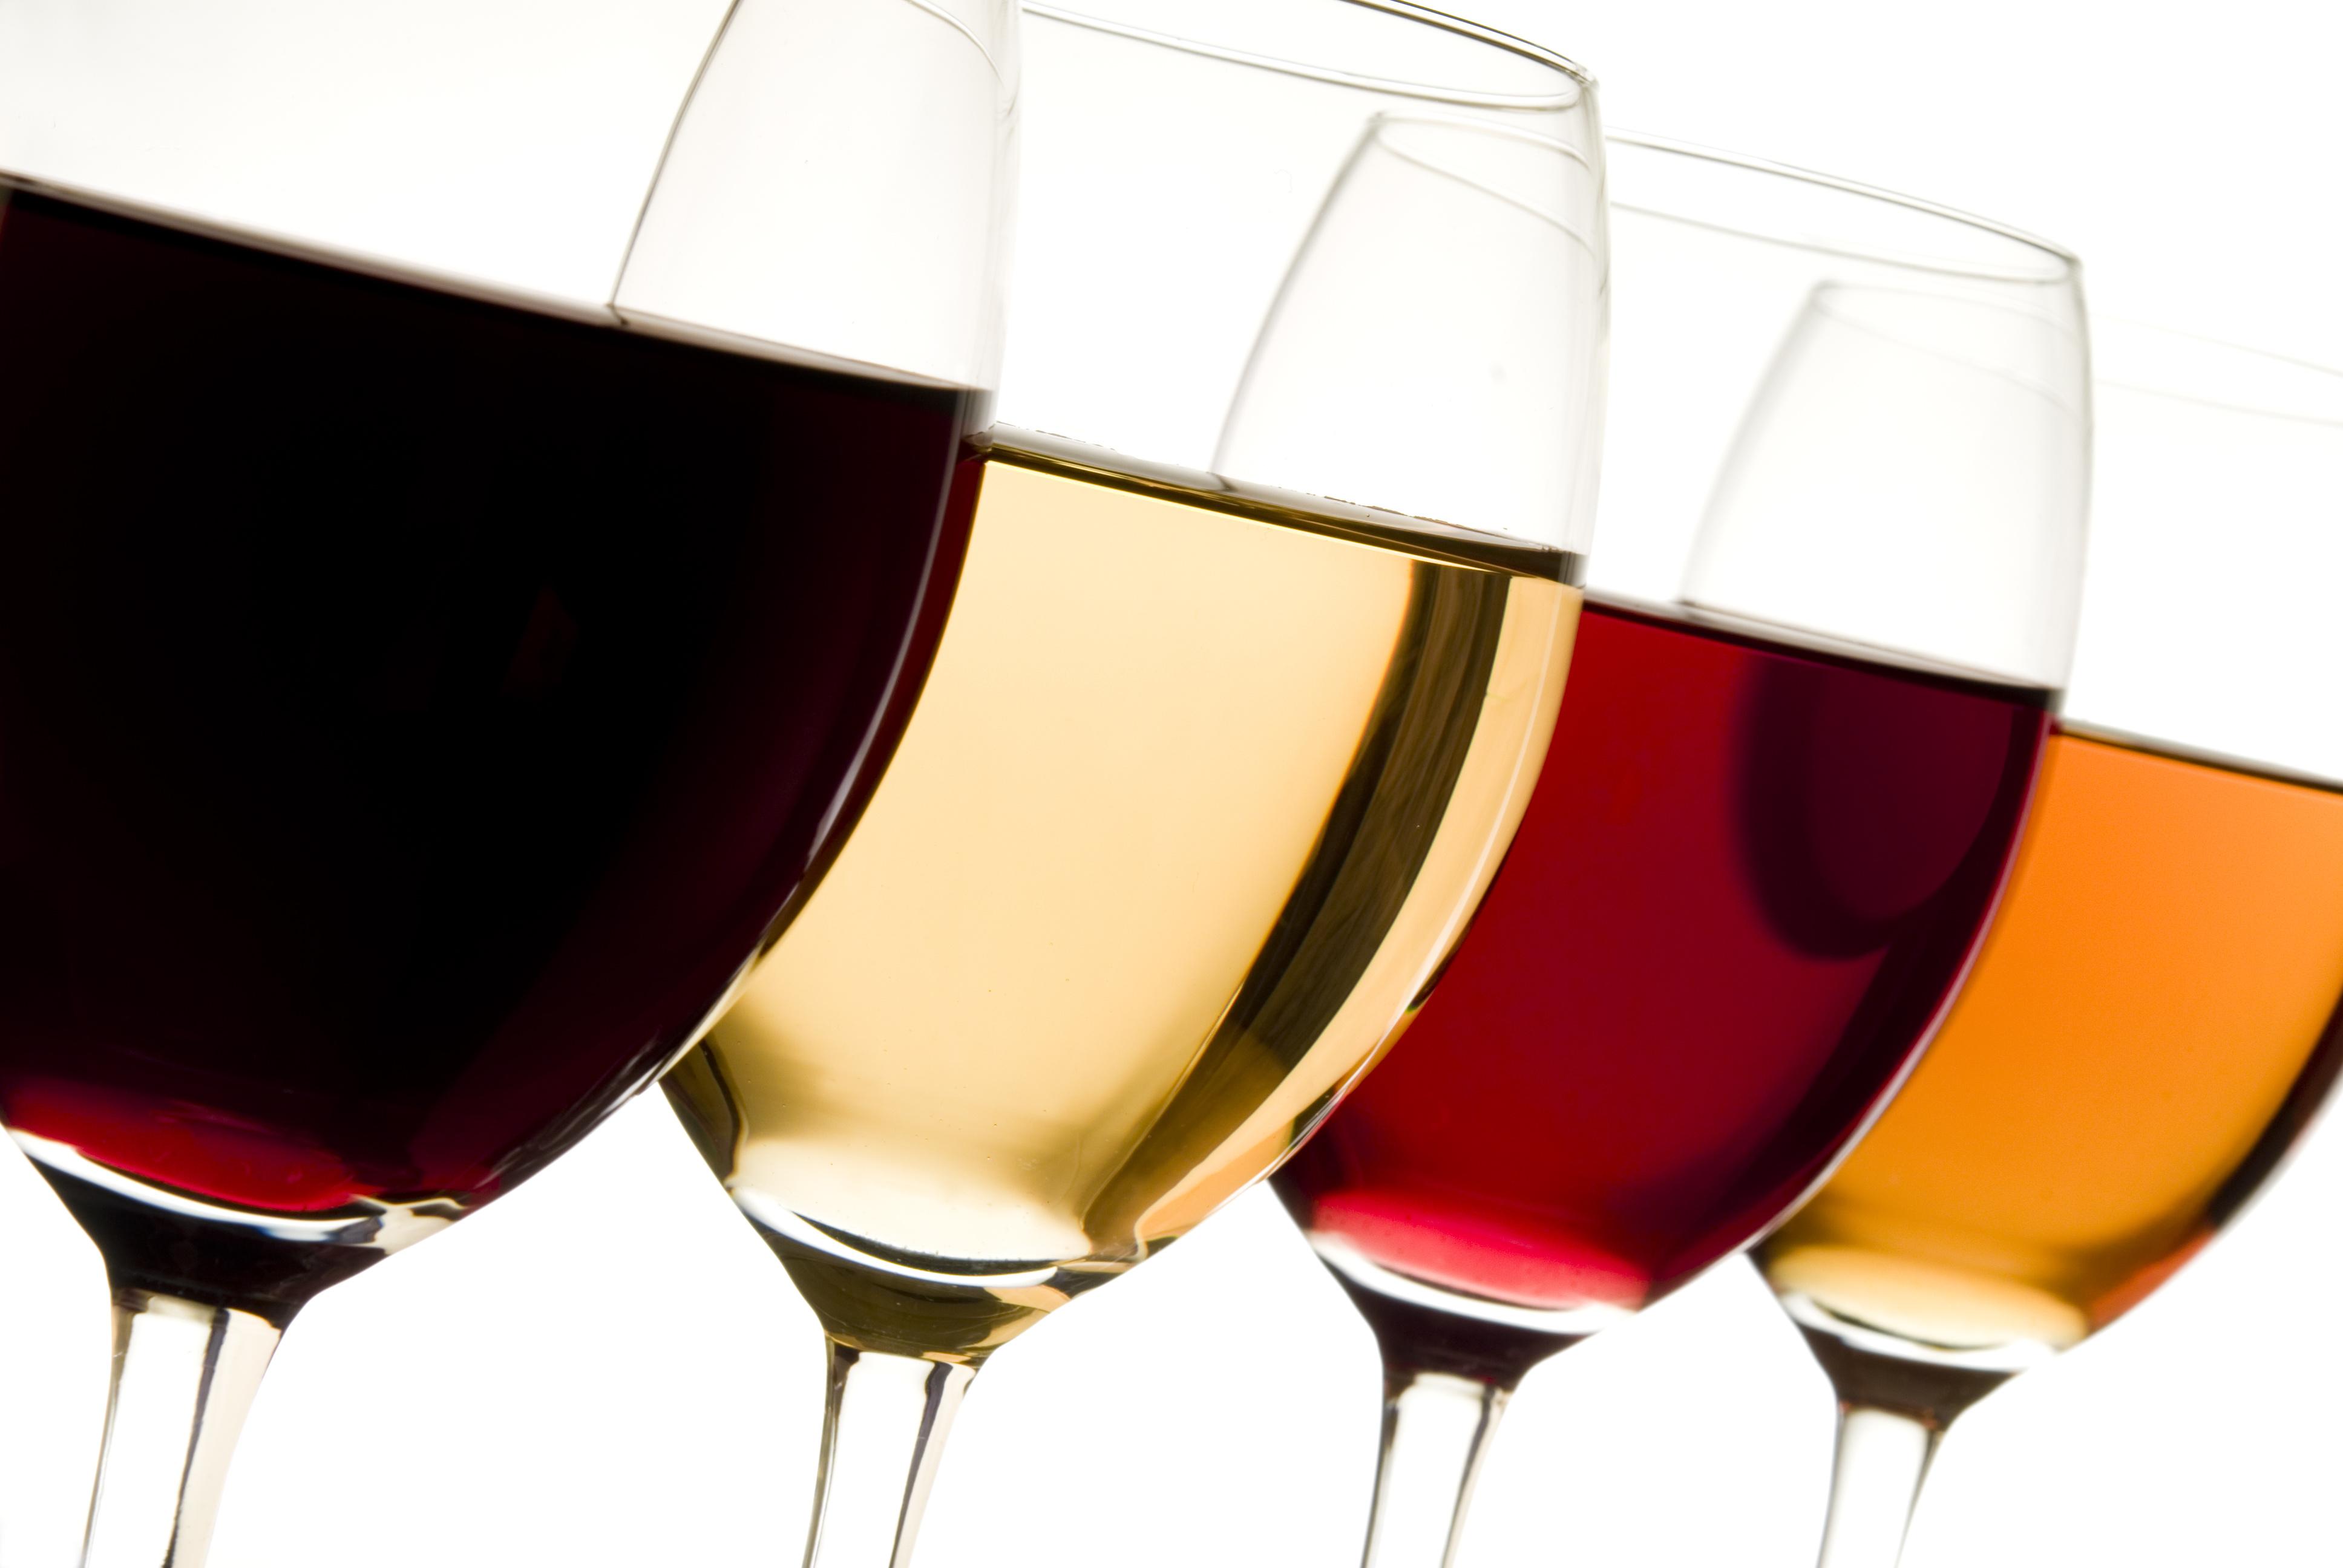 Un Vino, una comida